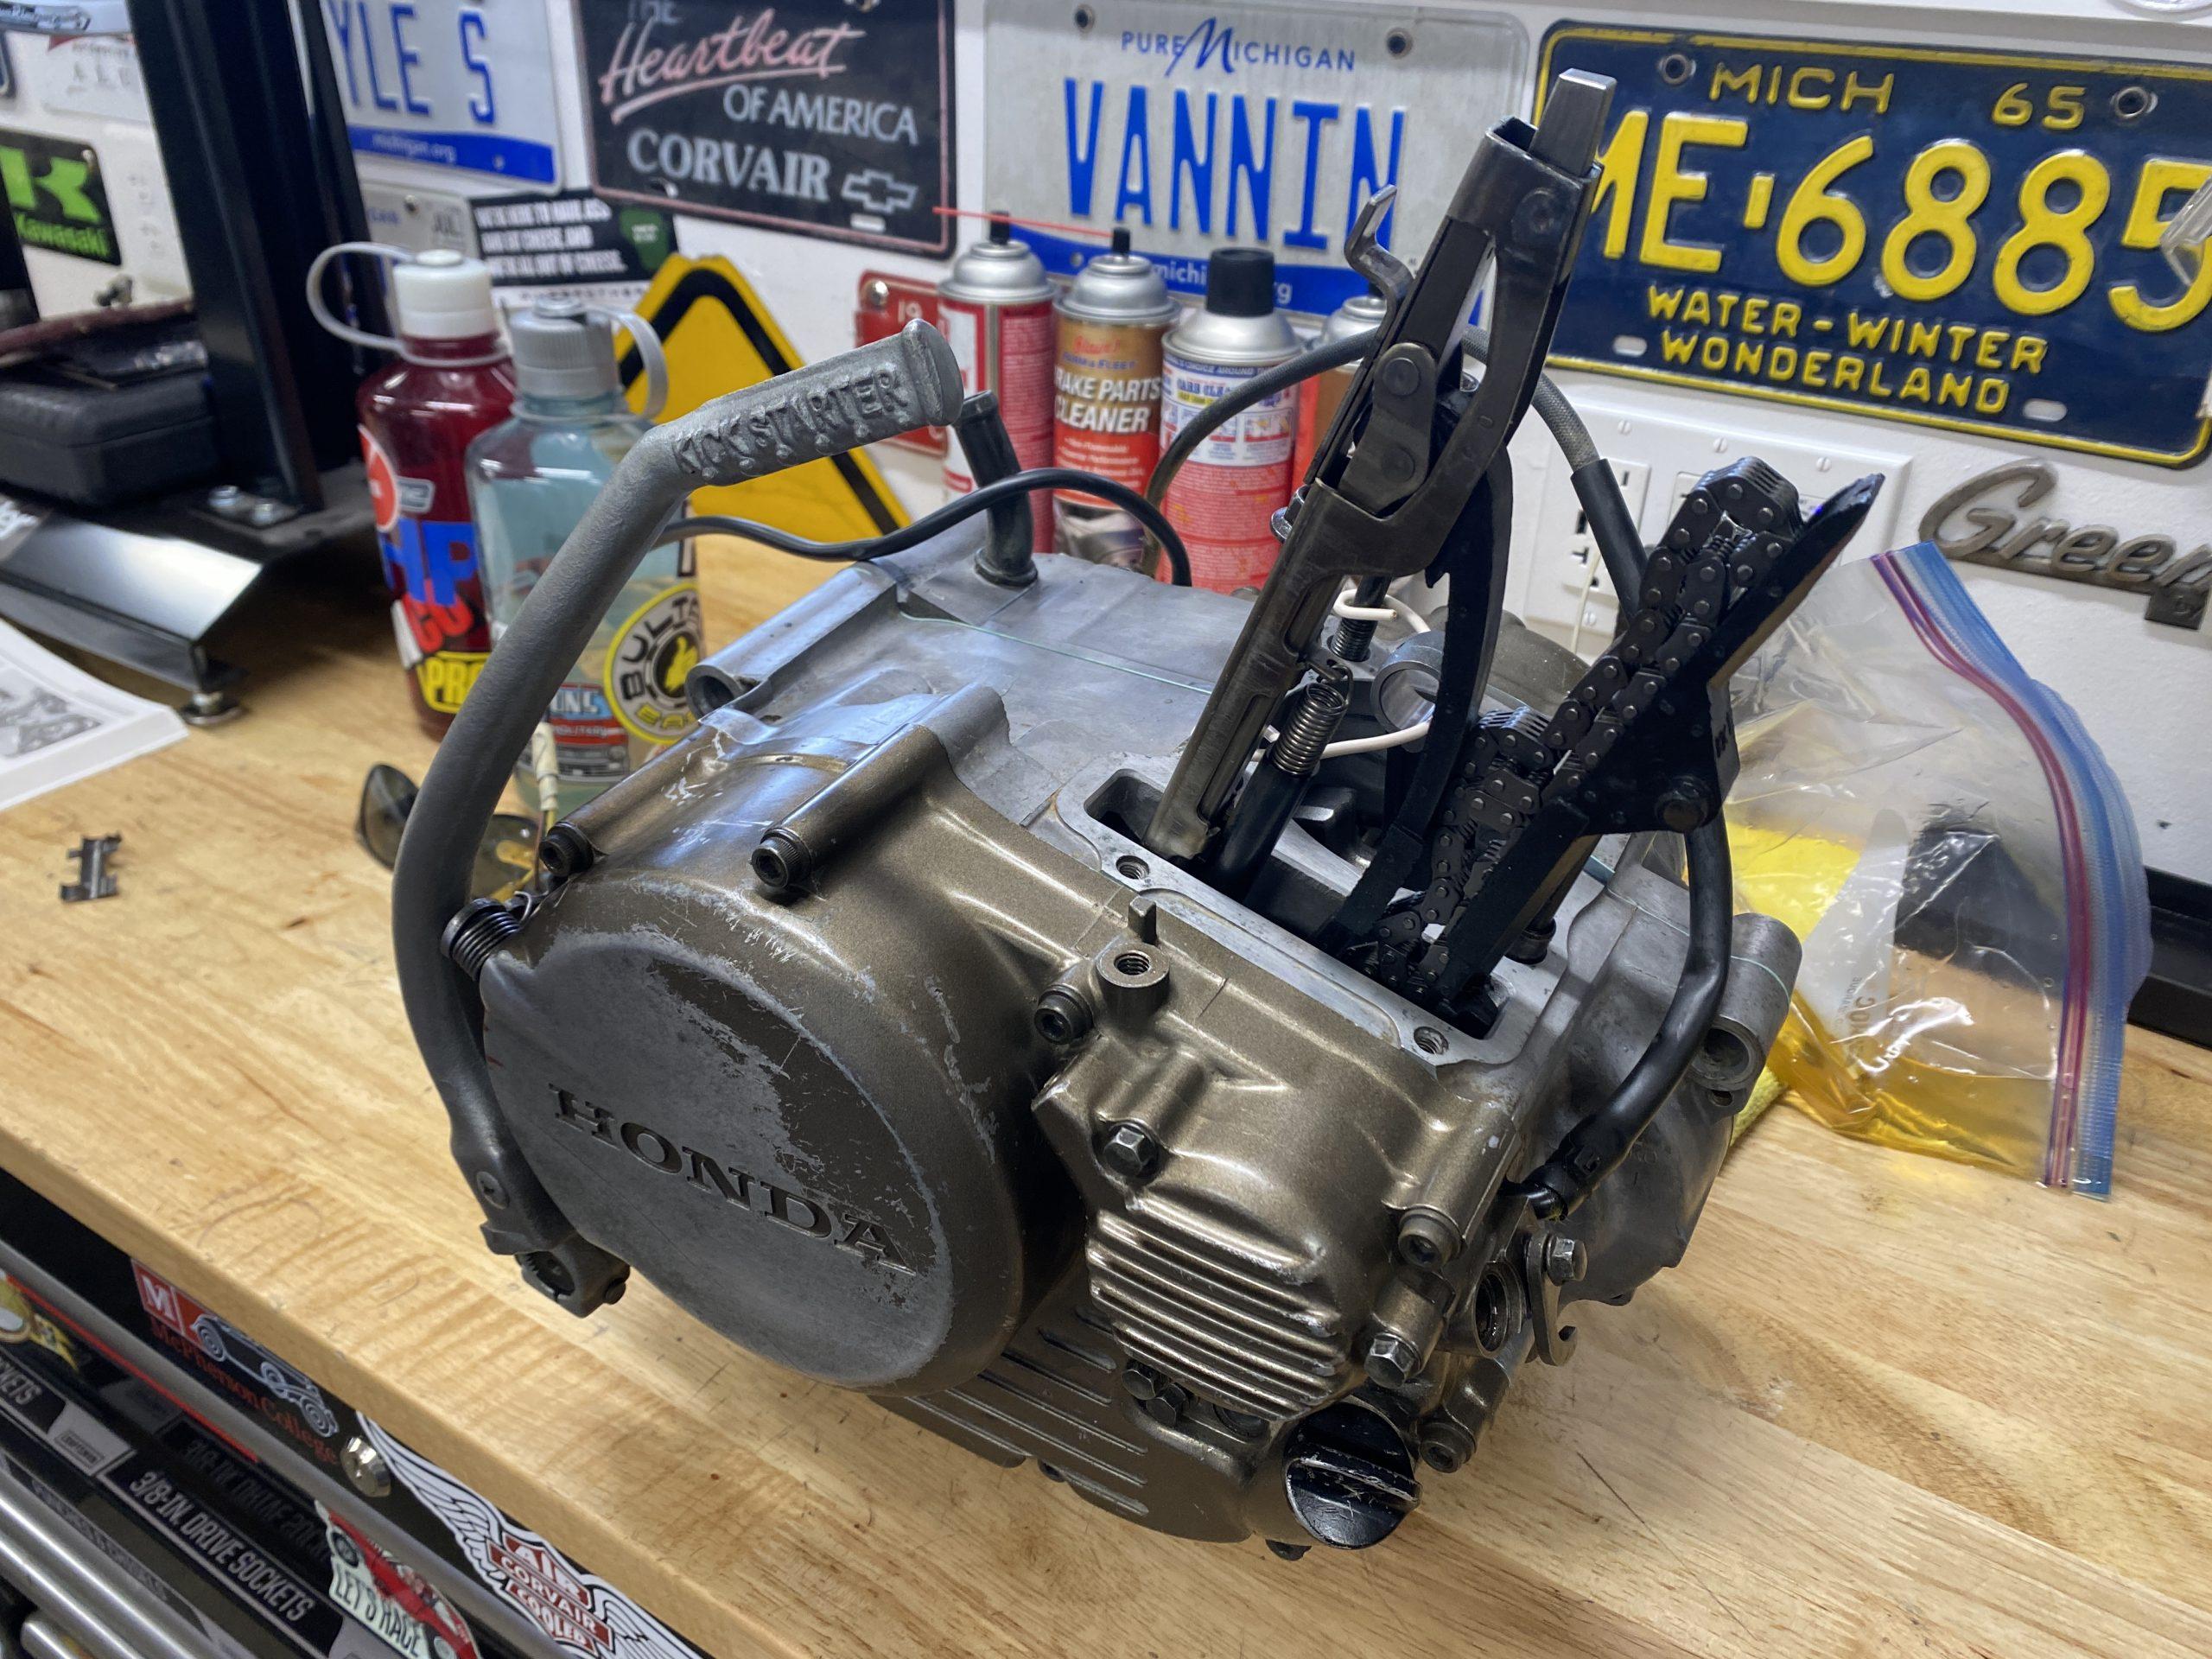 Assembled XR250R bottom end